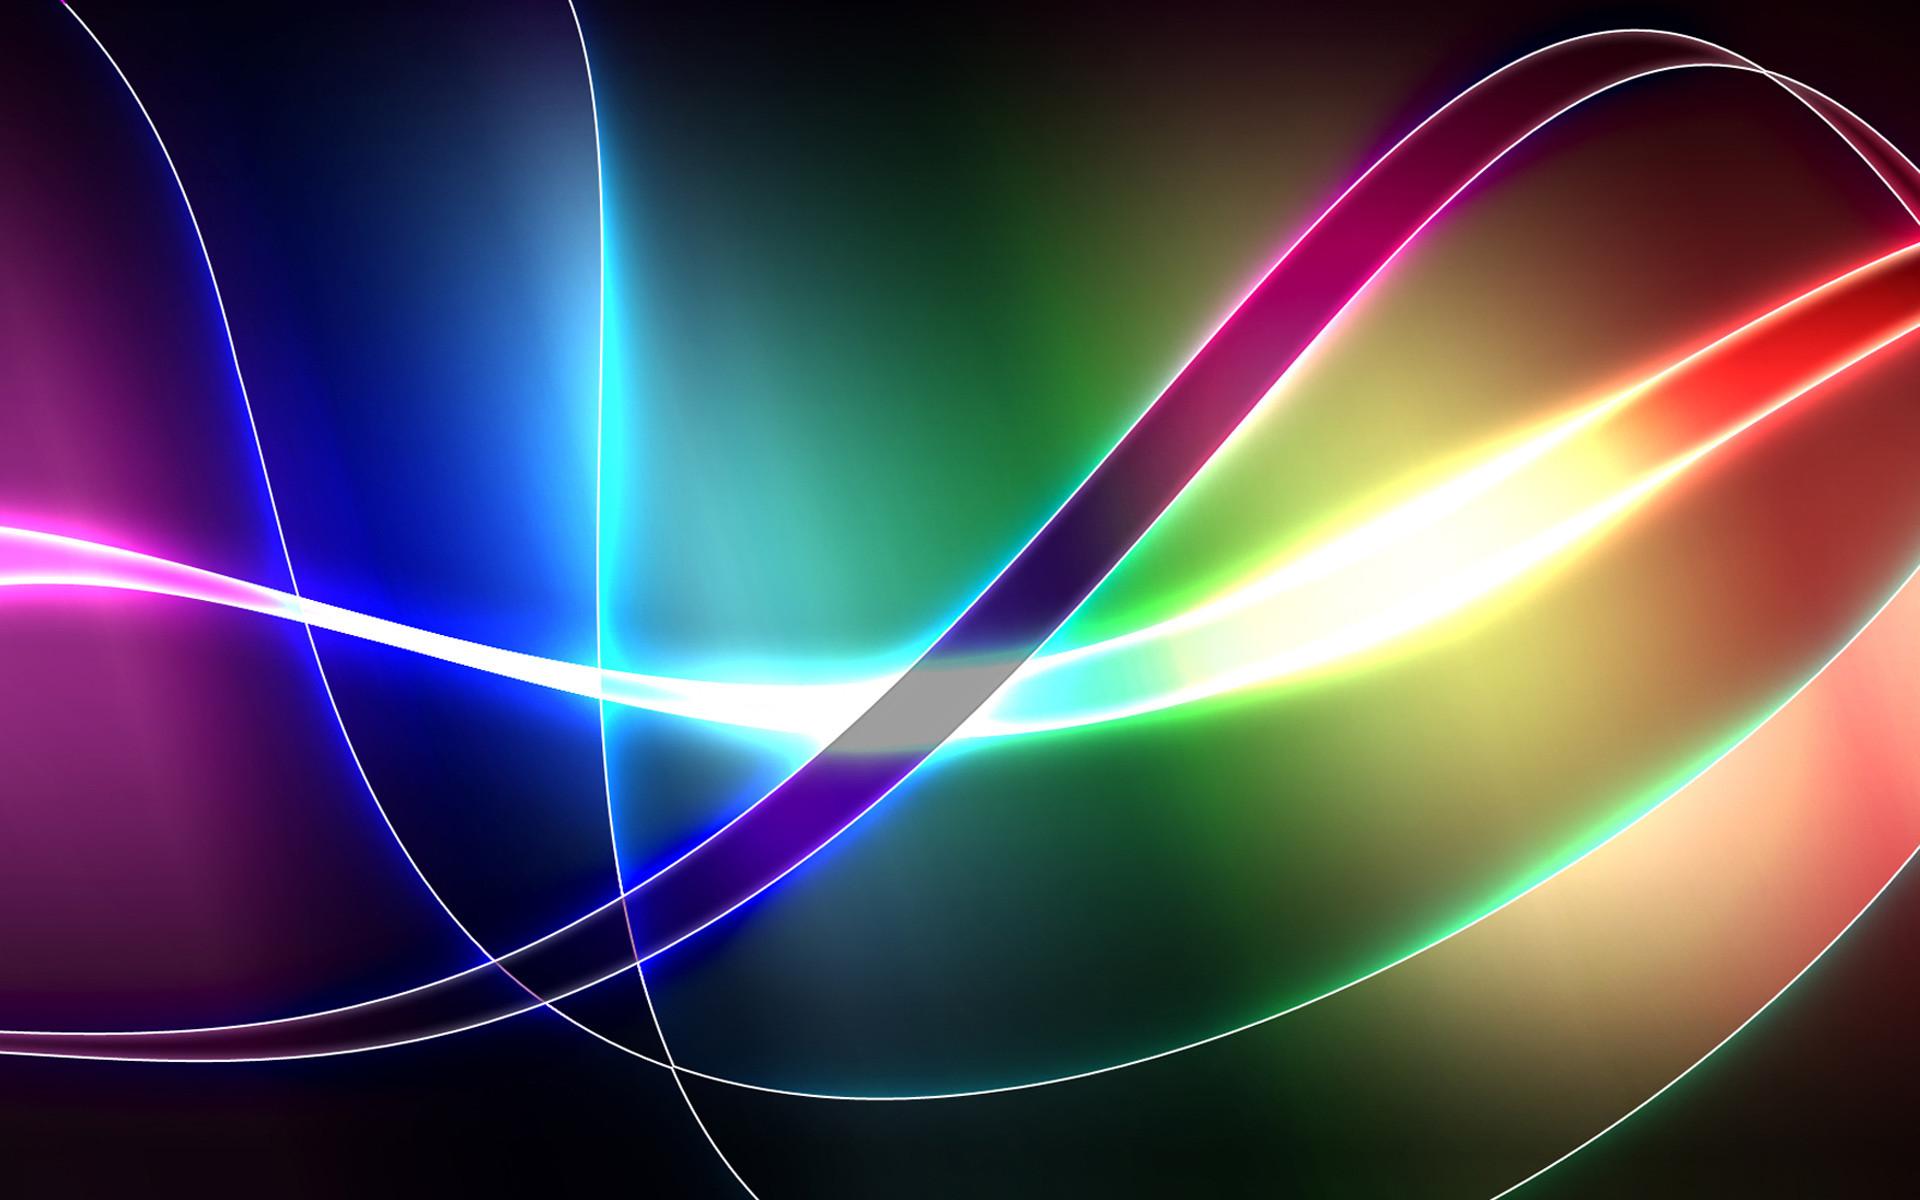 Abstract Cool Colors Shapes Patterns Shades Texture CGI Ribbons Abstract  Artistic Wallpaper